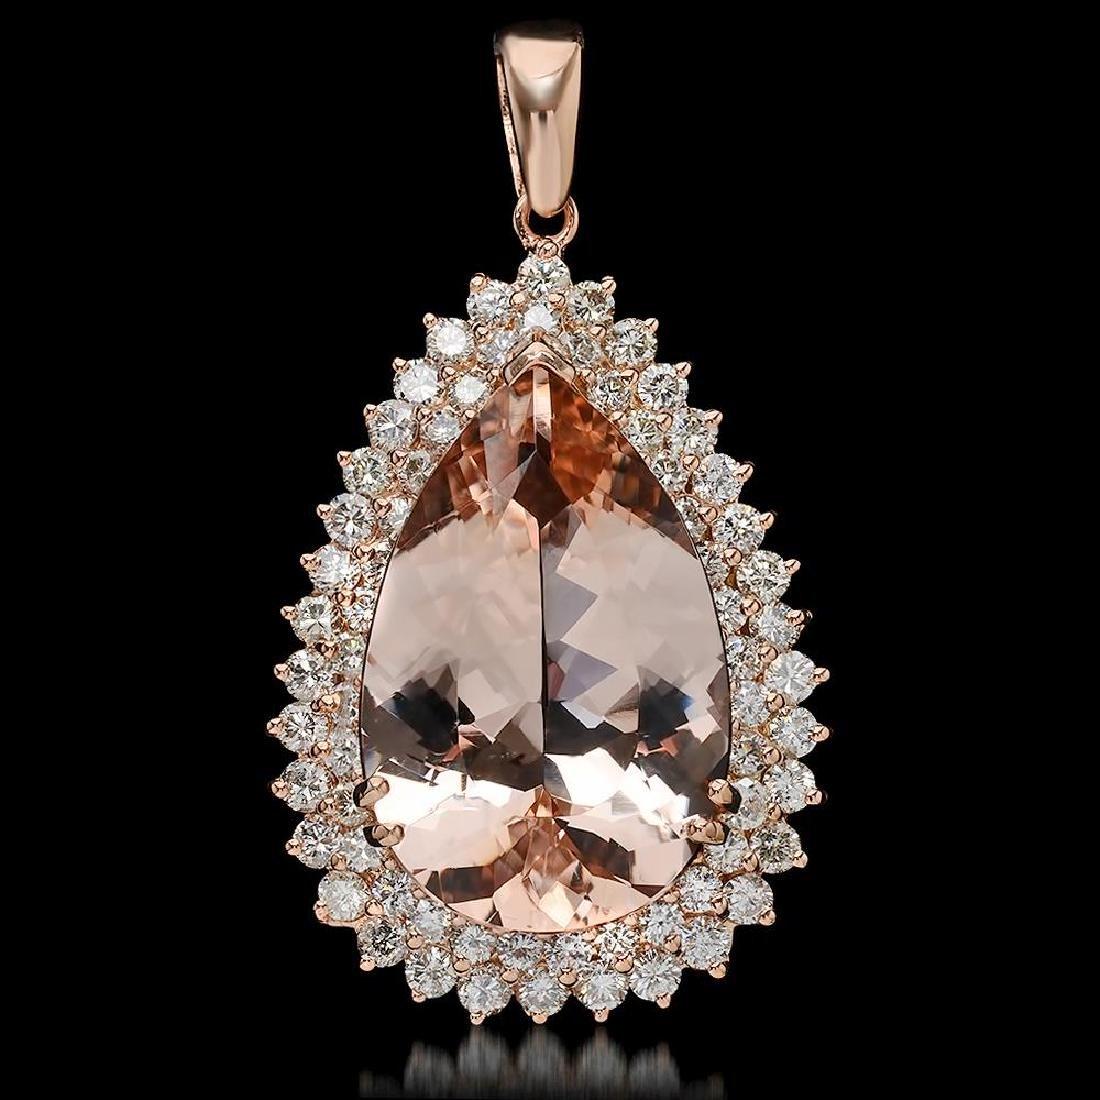 14K Gold 22.68ct Morganite 3.55ct Diamond Pendant